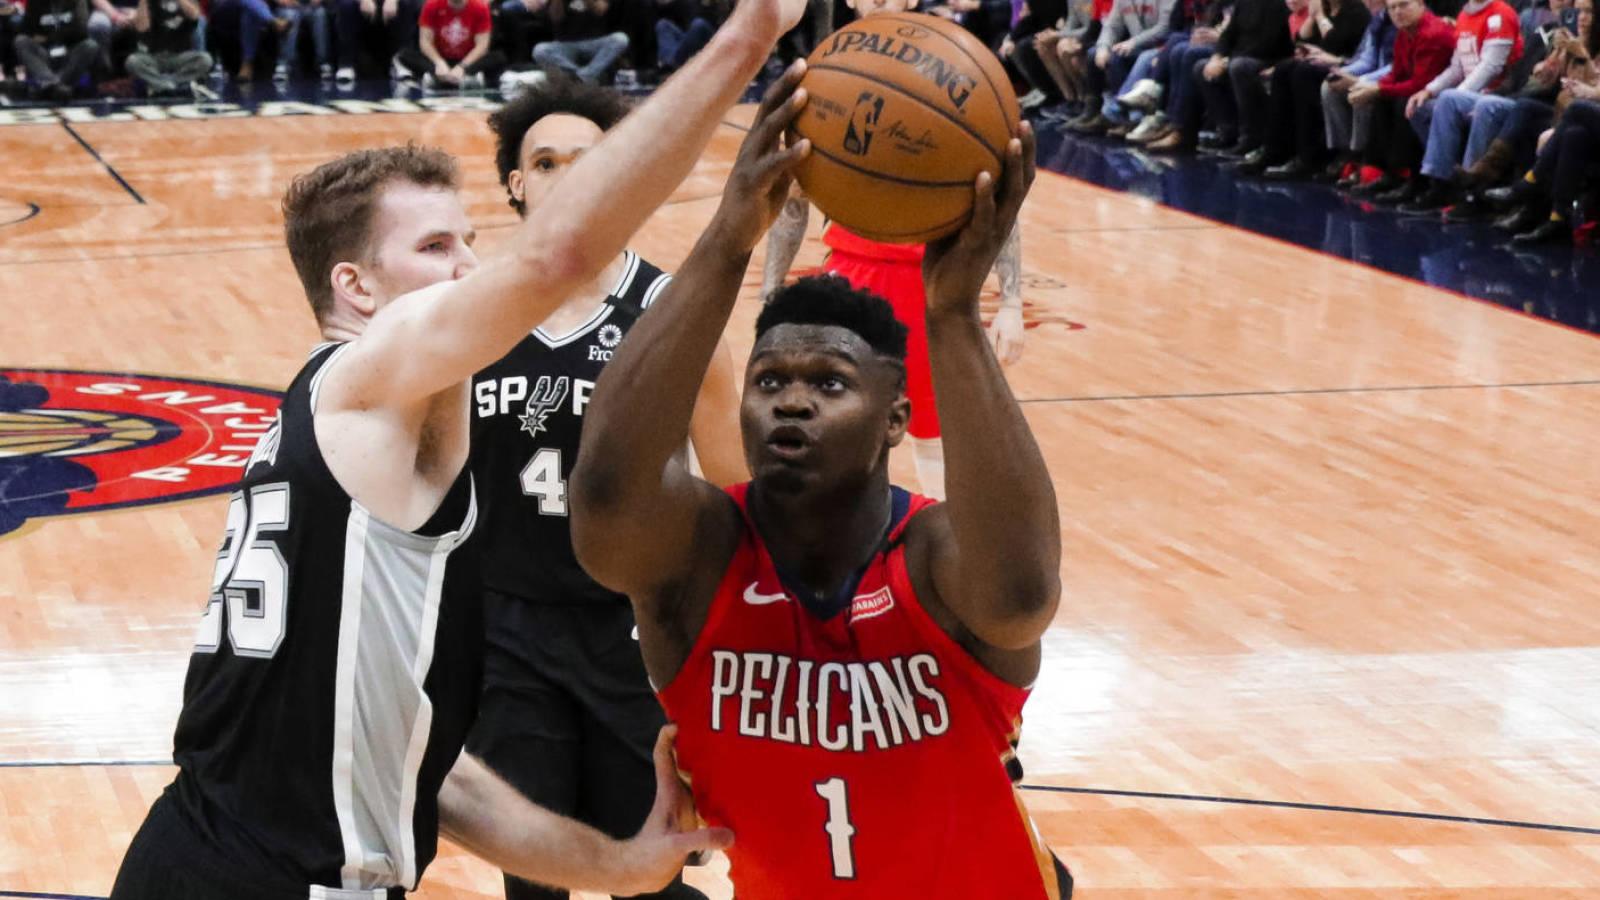 Zion's Electrifying NBA Debut